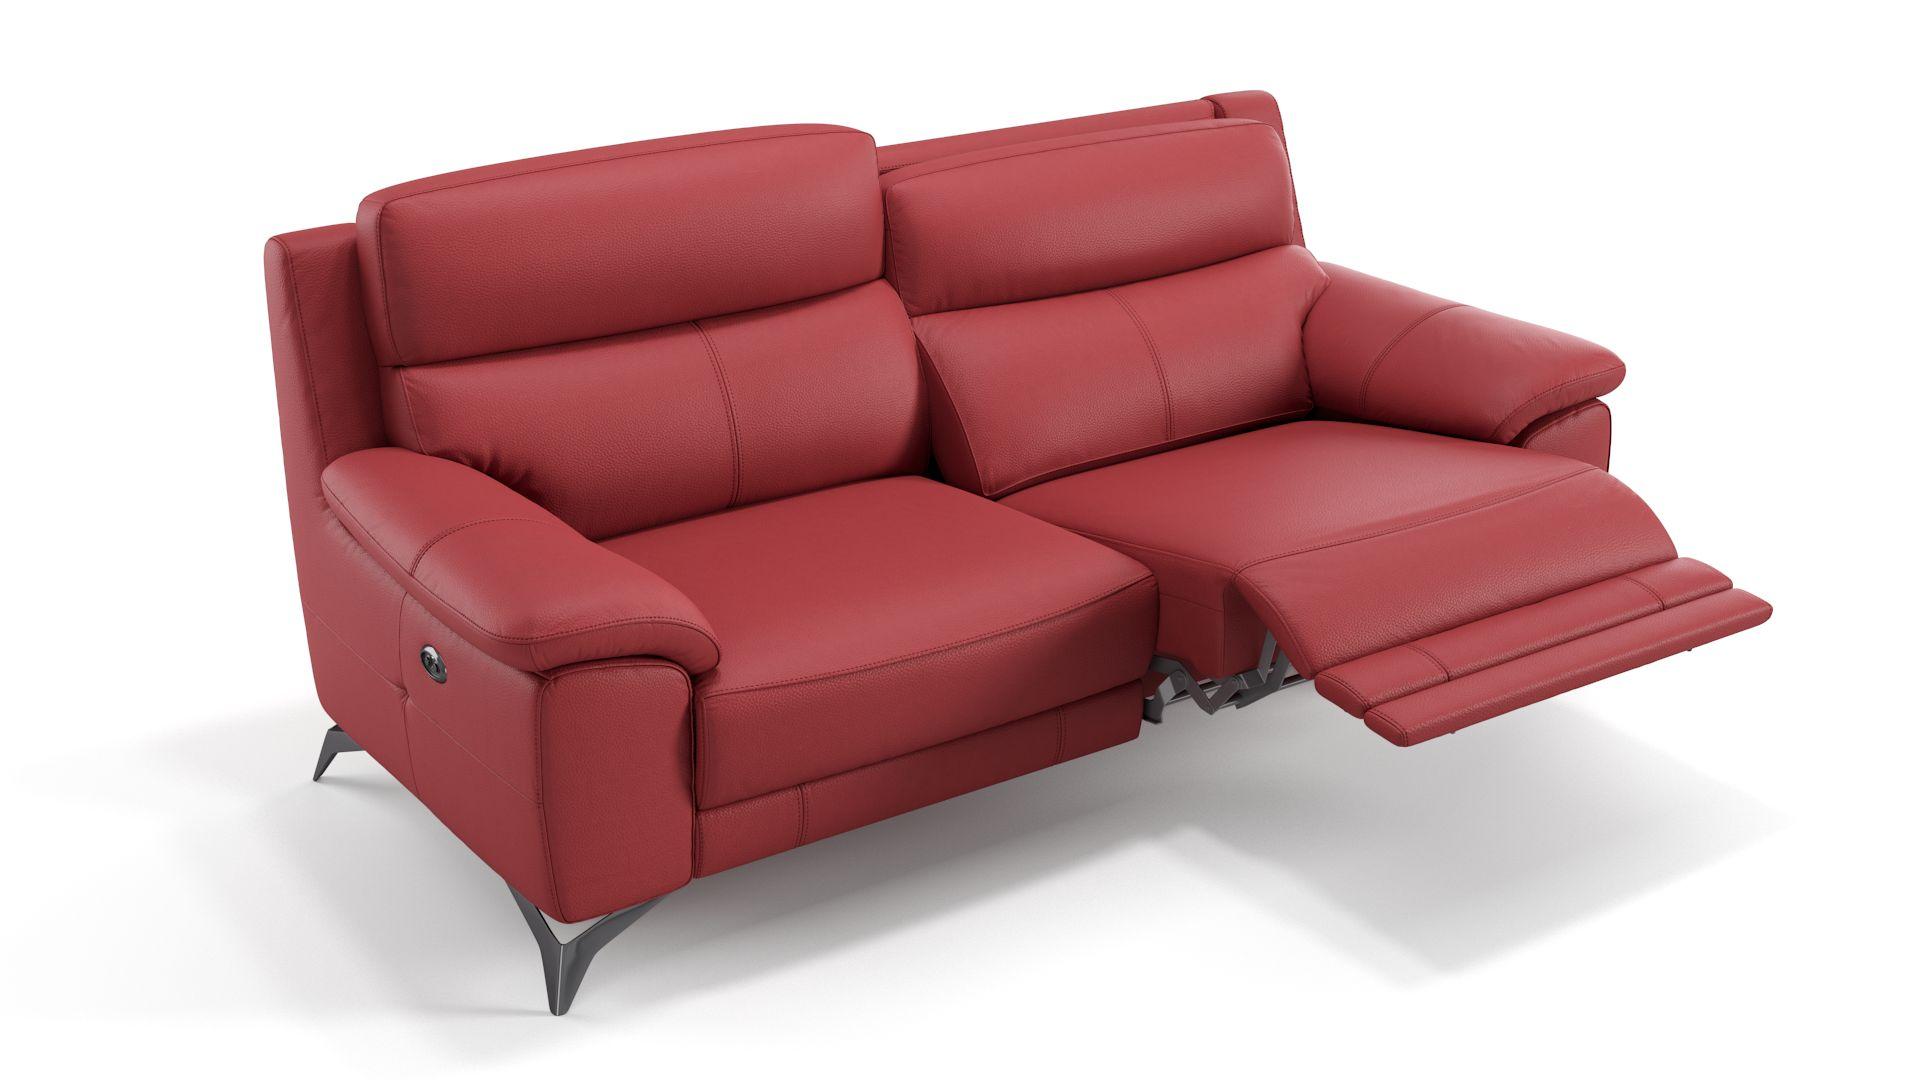 Leder 3-Sitzer Sofa LANTELLA